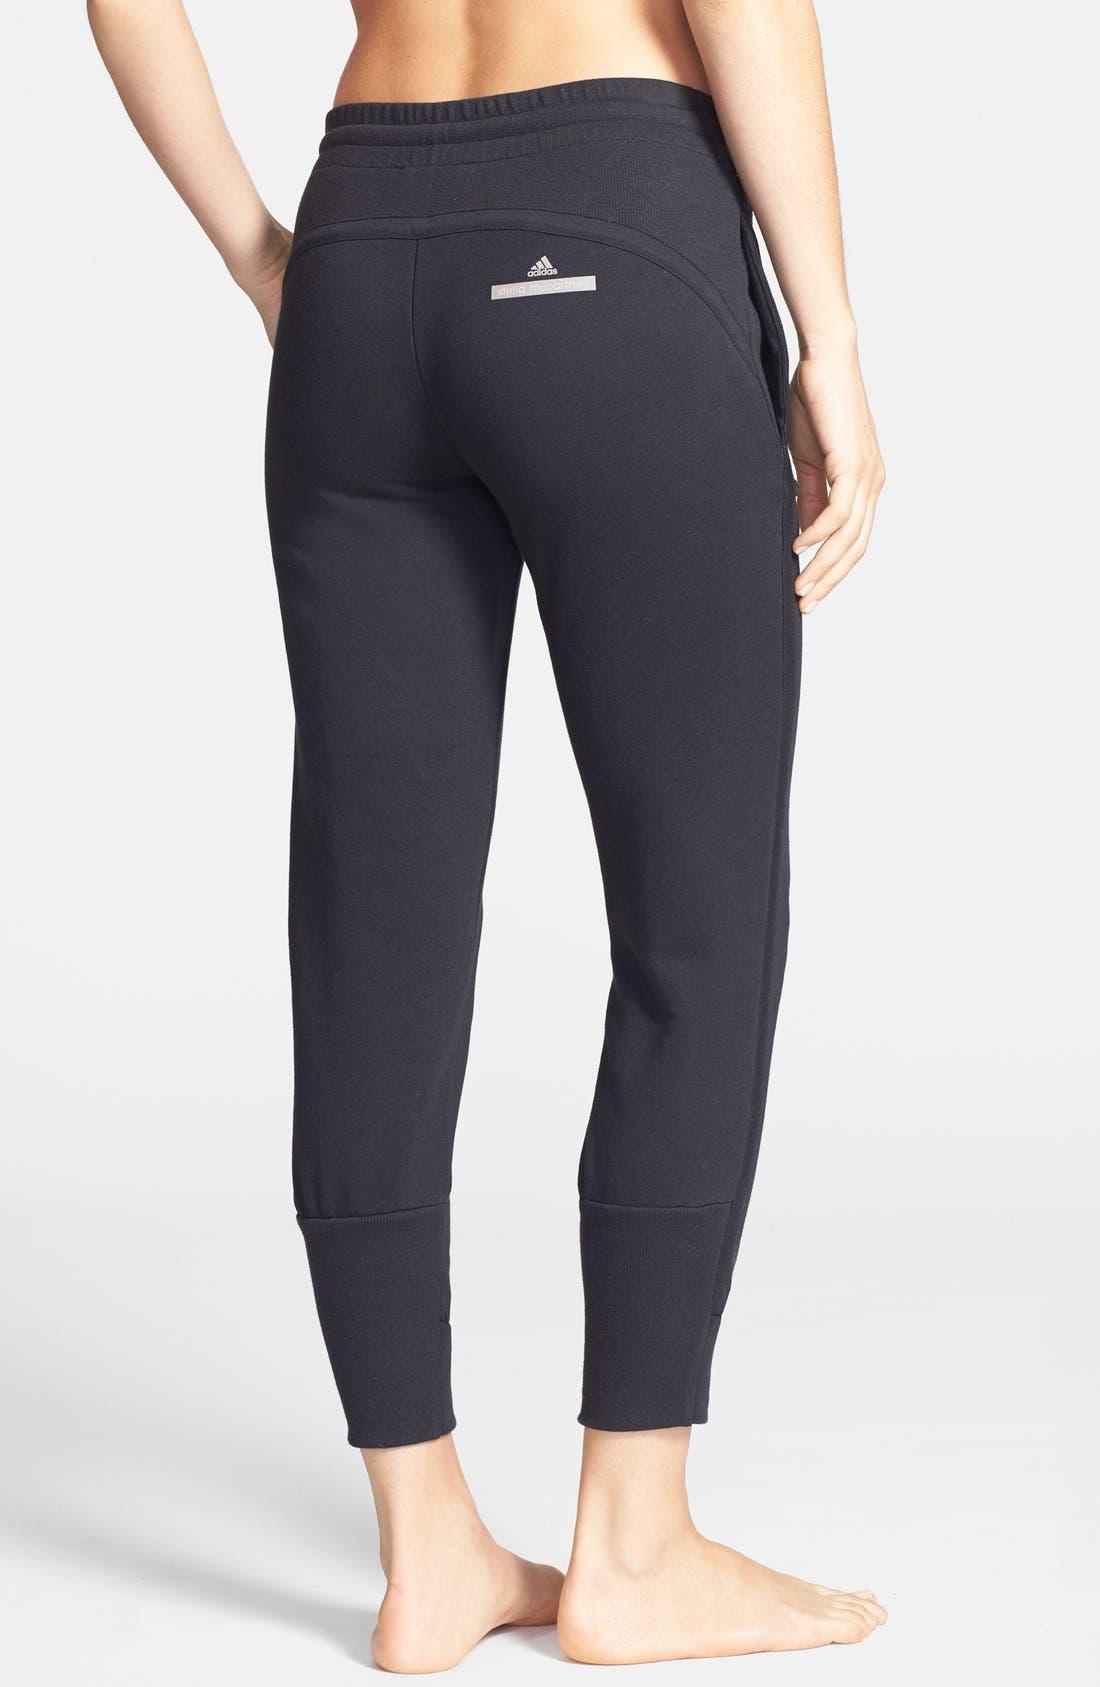 Alternate Image 2  - adidas by Stella McCartney 'Essentials' Sweatpants